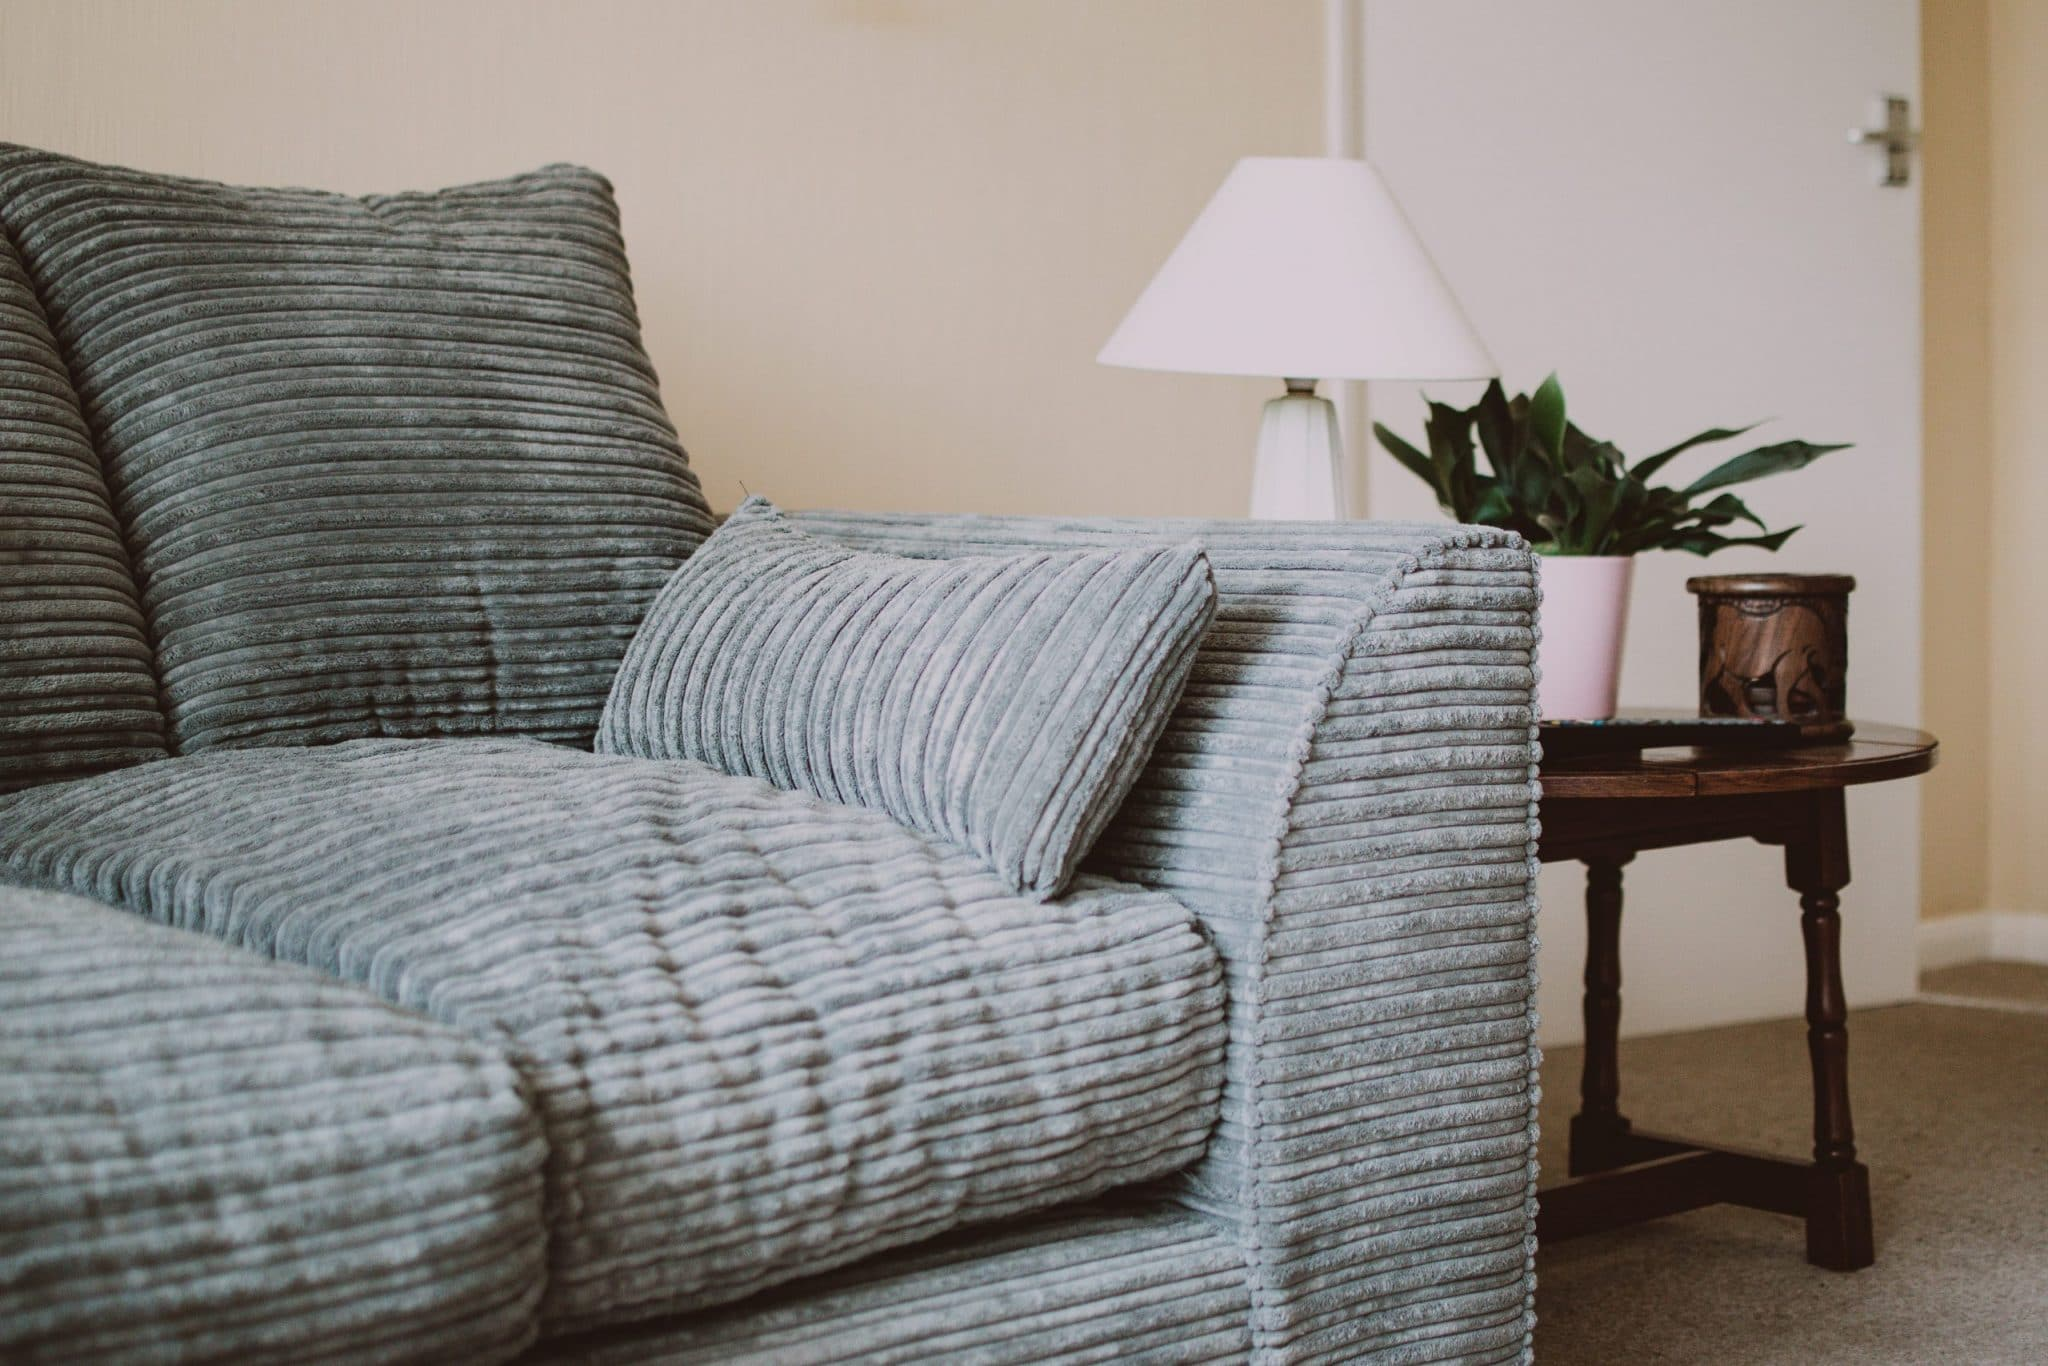 sofa cleaning in kenosha, kenosha sofa cleaning, cleaning sofas in kenosha